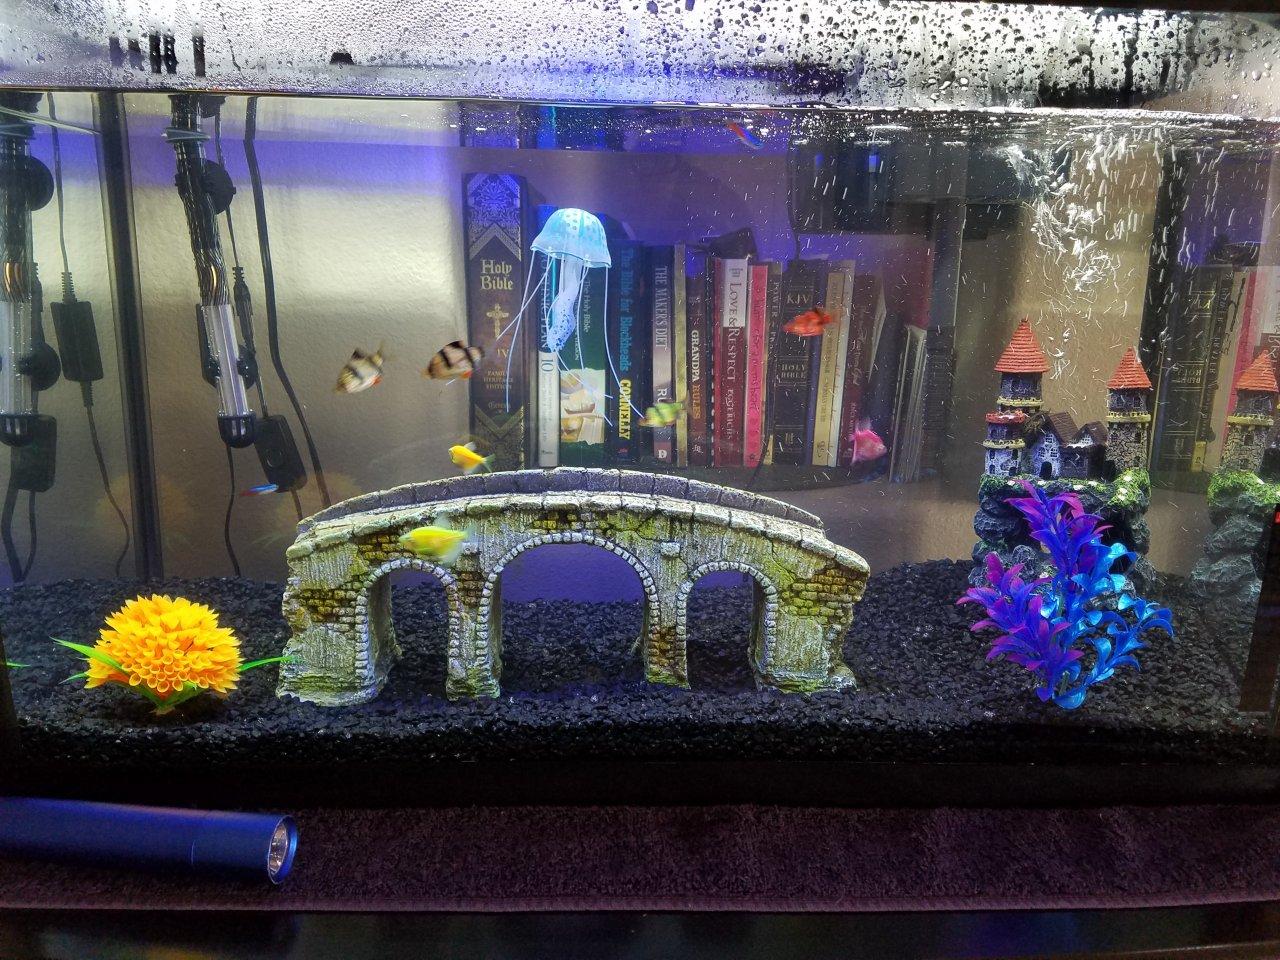 Freshwater fish tank has cloudy water - Freshwater Fish Tank Has Cloudy Water